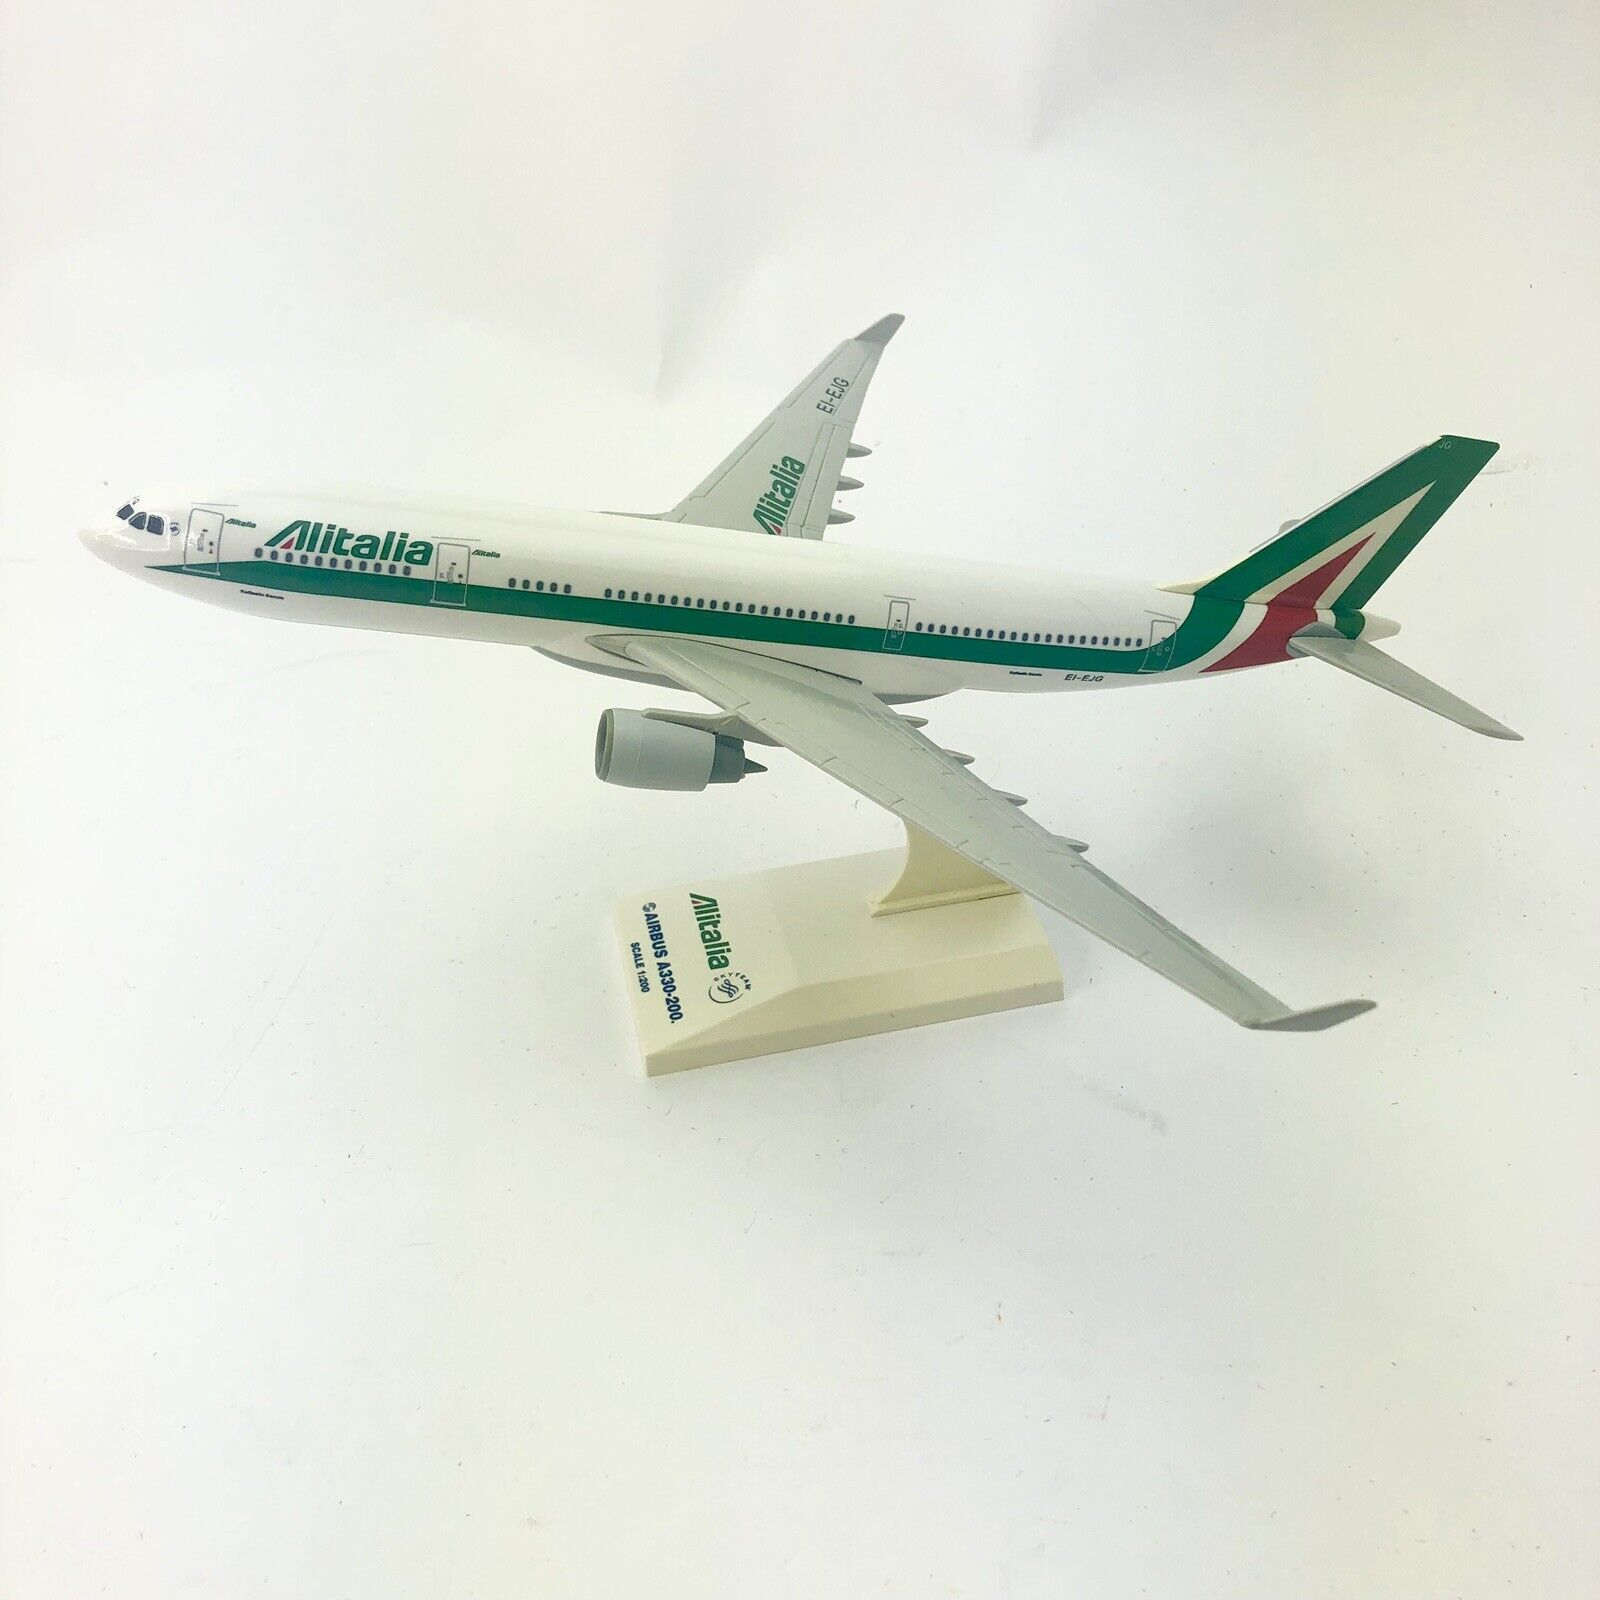 1 200 Alitalia Airbus A330-200 EI-EJG EI-EJG EI-EJG Airplane Model SkyTeam Sky Marks 422dcd